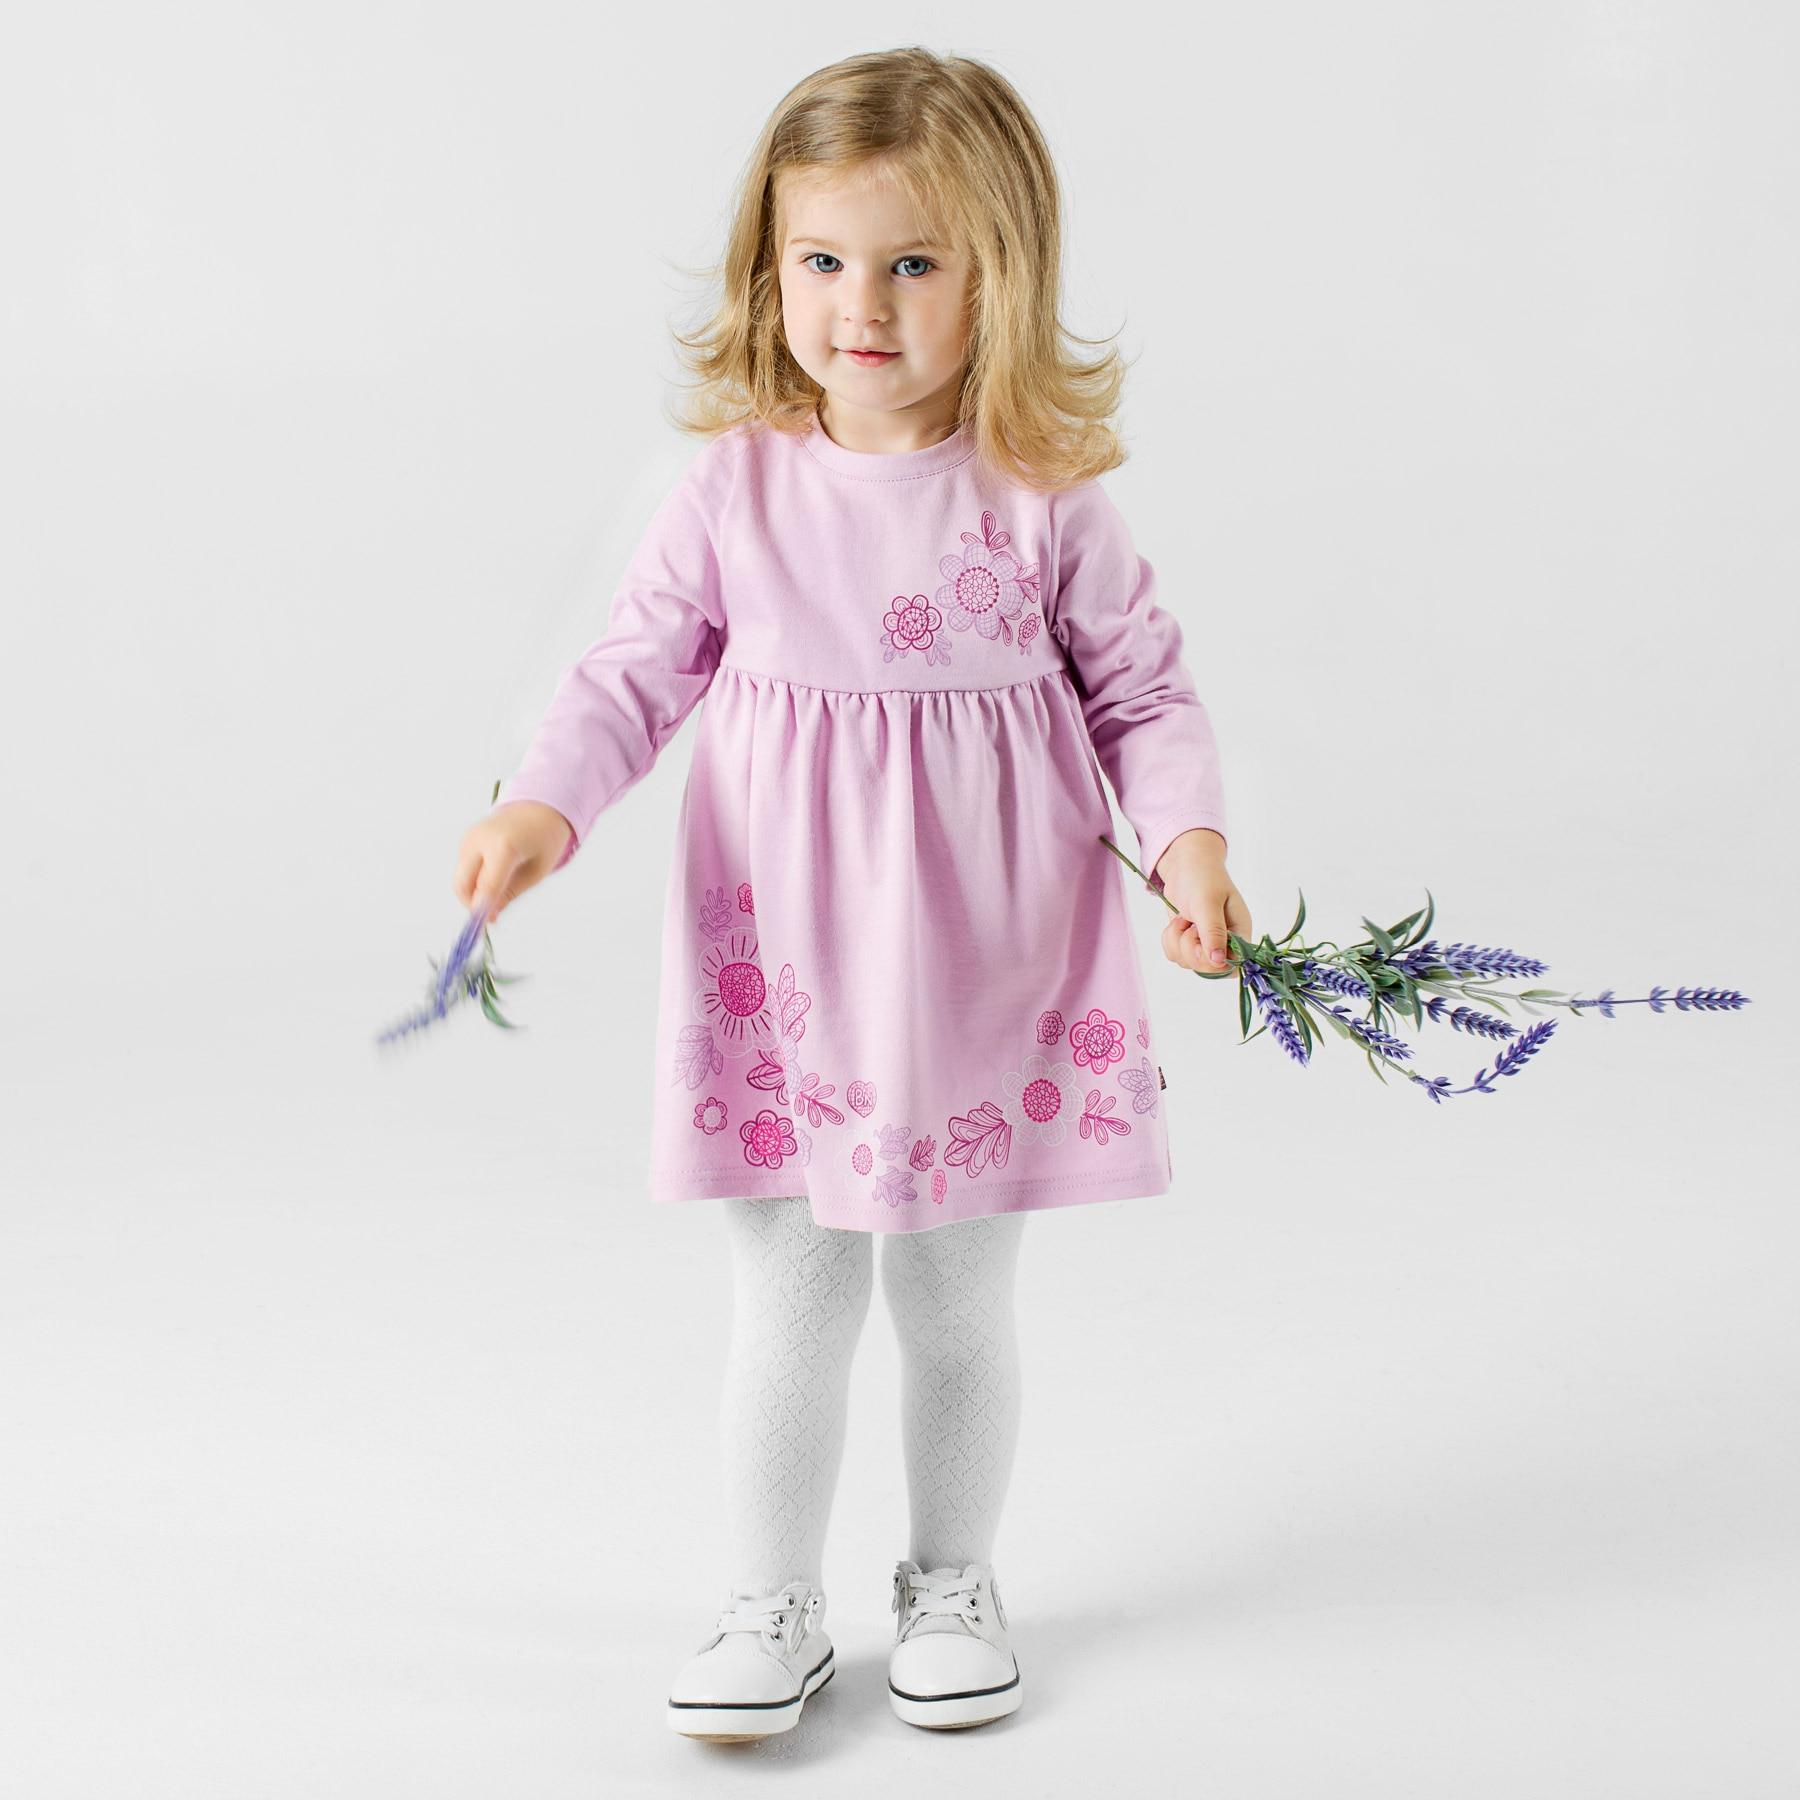 Bossa Nova Dress for girls 135B-161s платья для девочки summer gtyle baby girl версия для печати flower dot girl dress for wedding girls party dress with bow dress for 4 8 years